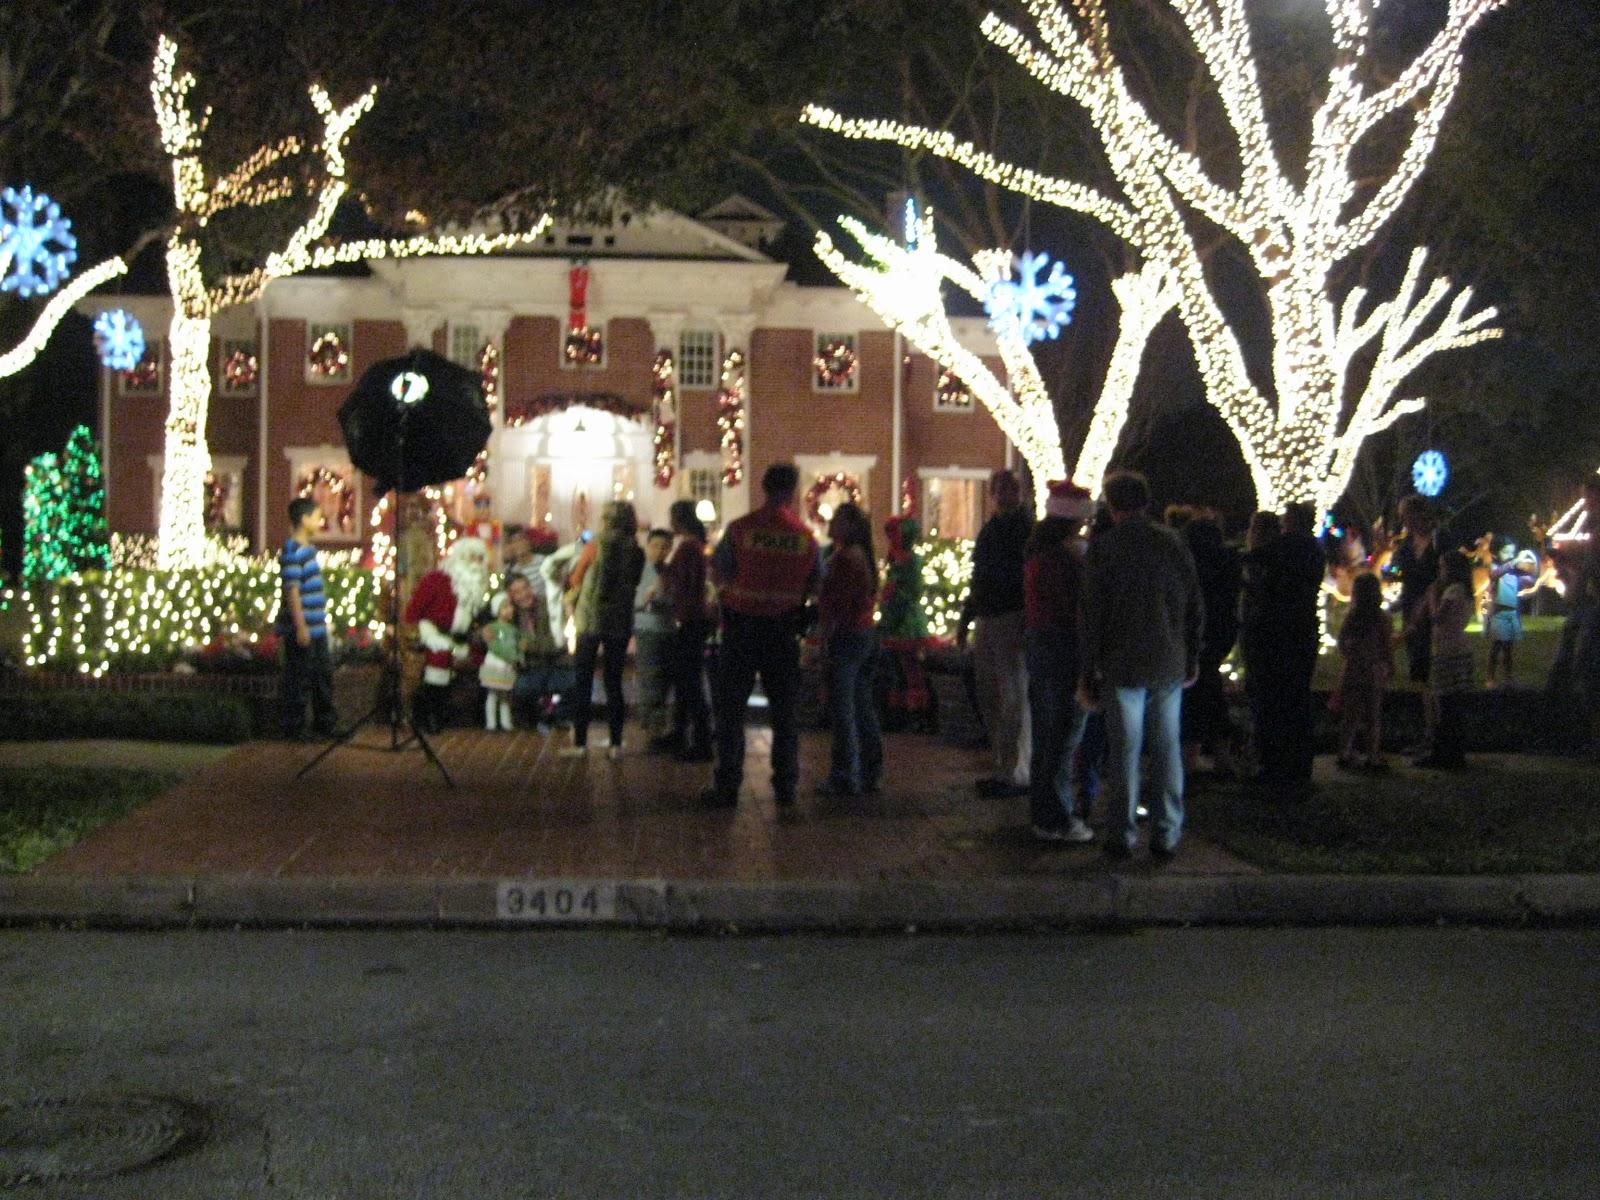 Texquiem River Oaks Christmas Lights There Goes the Neighborhood